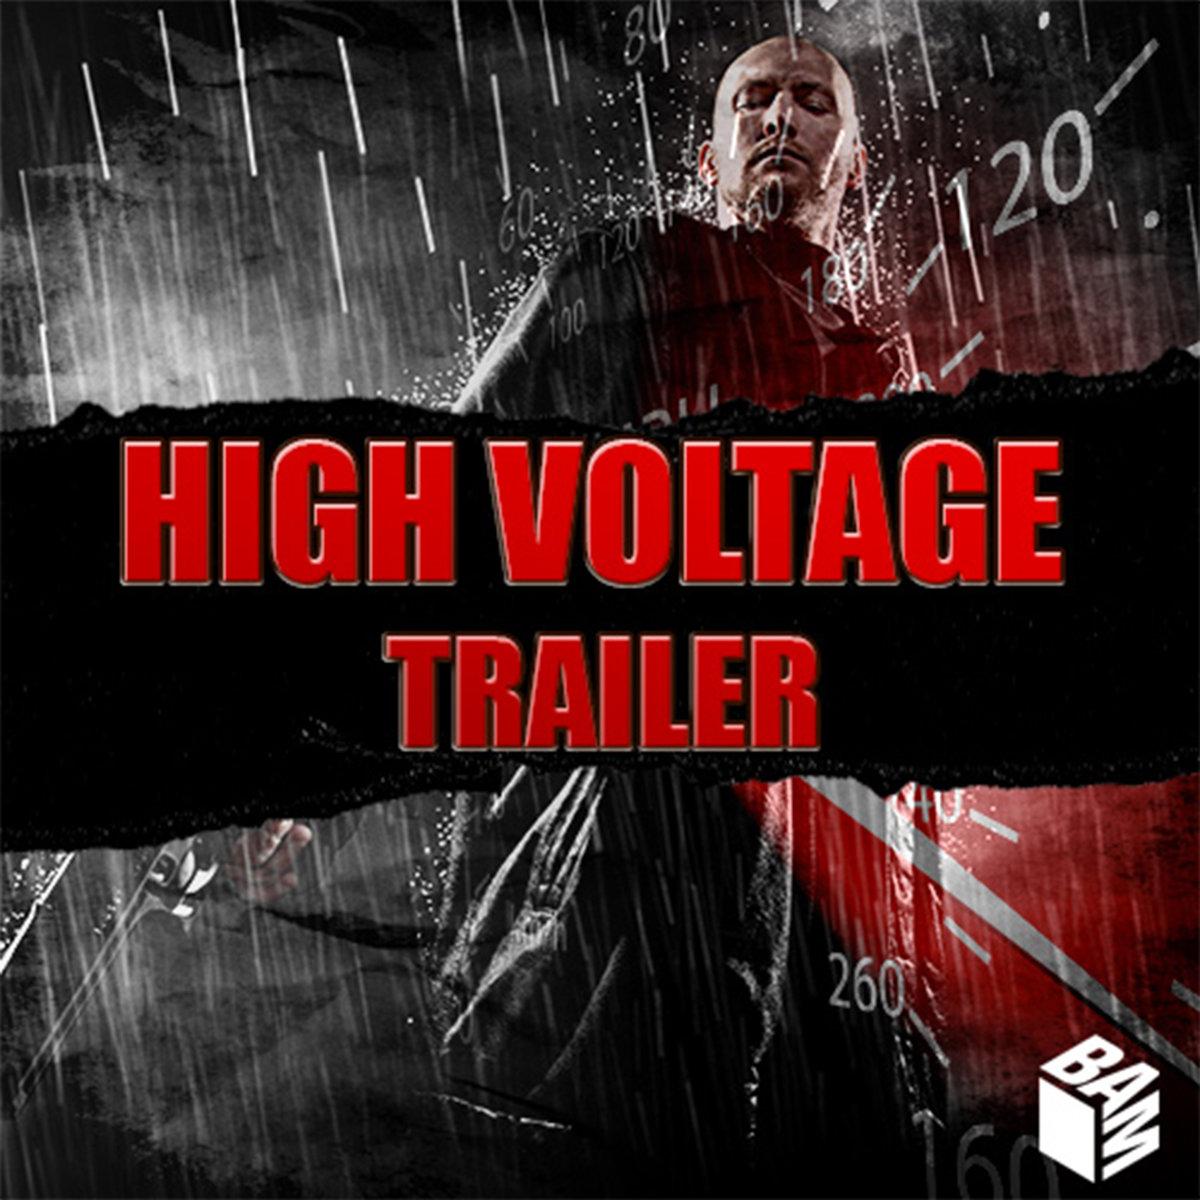 High Voltage Thomas : High voltage trailer музыка для трейлеров